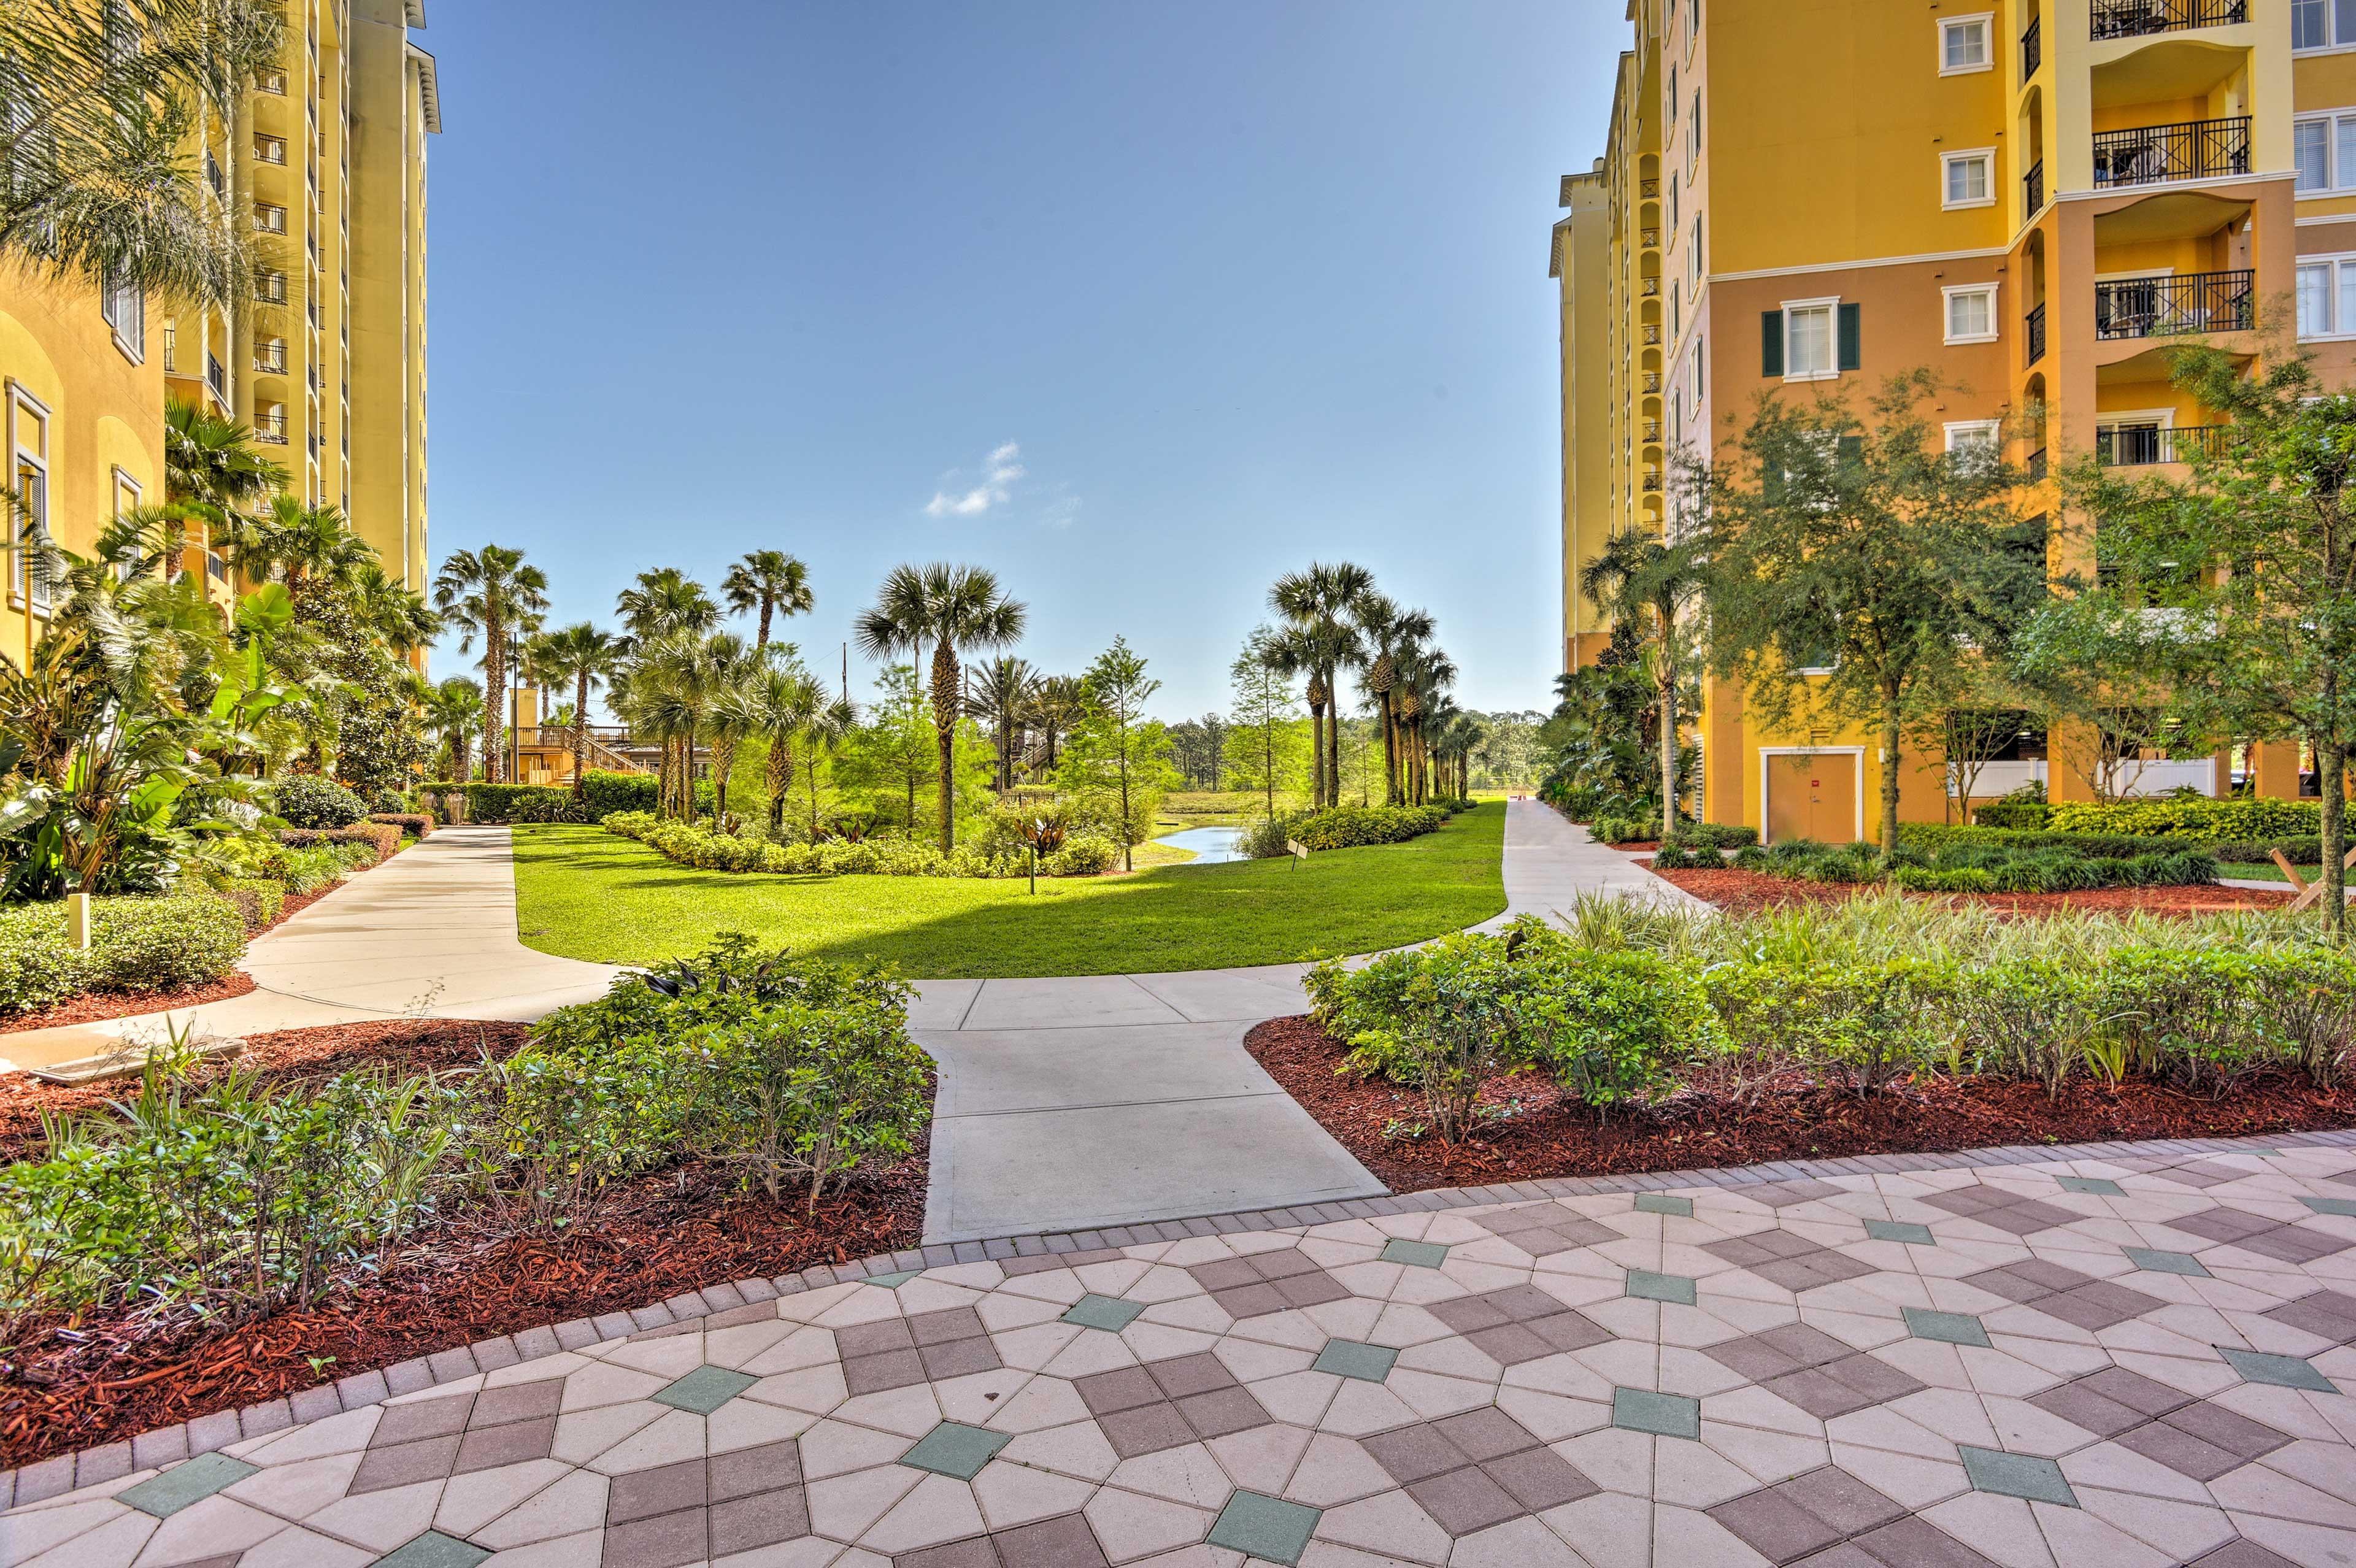 Take scenic strolls through the lush, tropical gardens.